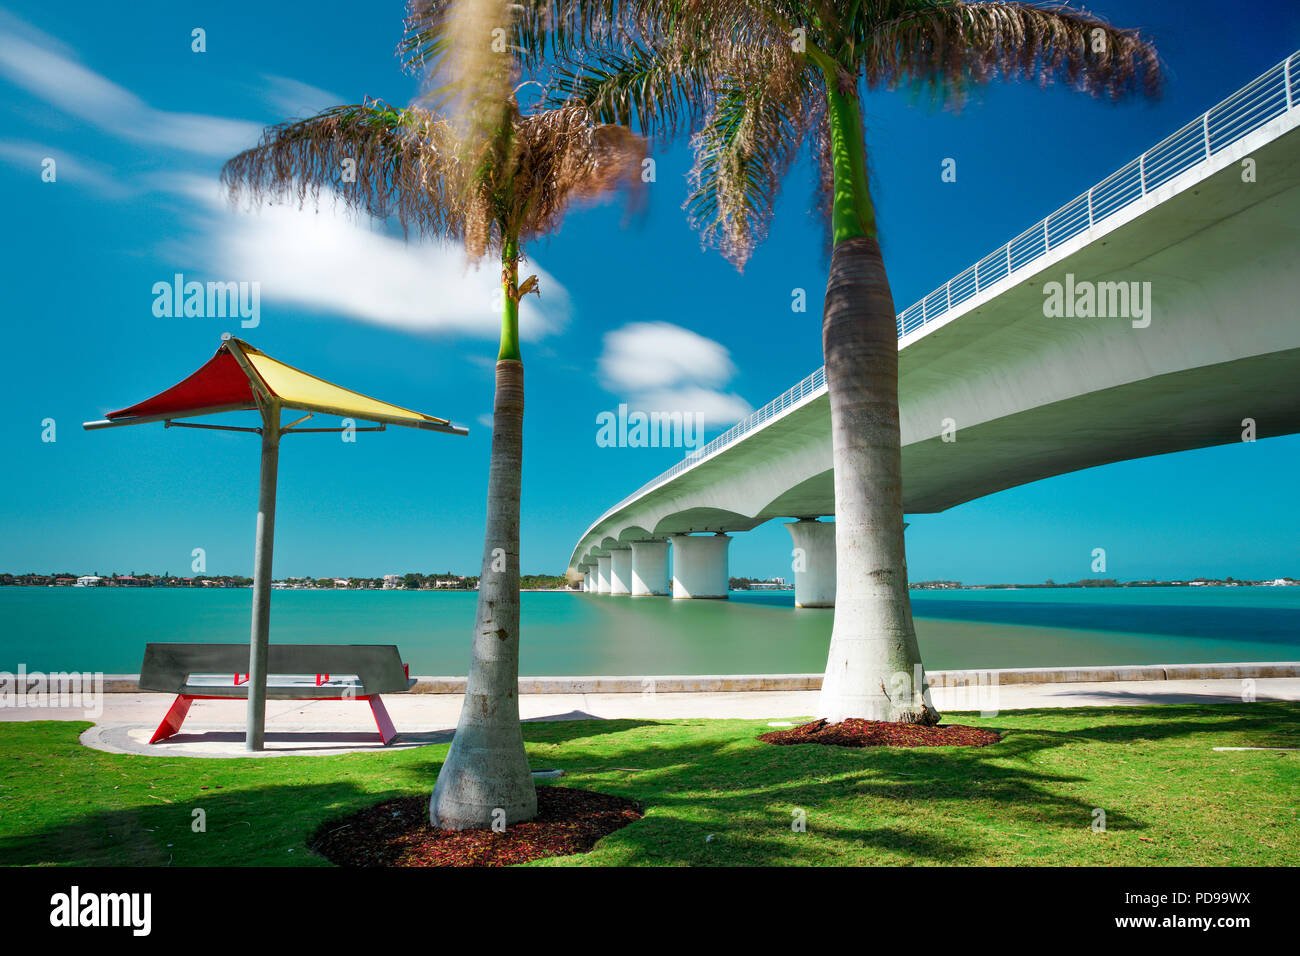 Summer palm tree, John Ringling Causeway at Eloise Werlin Park, Sarasota Florida - Stock Image